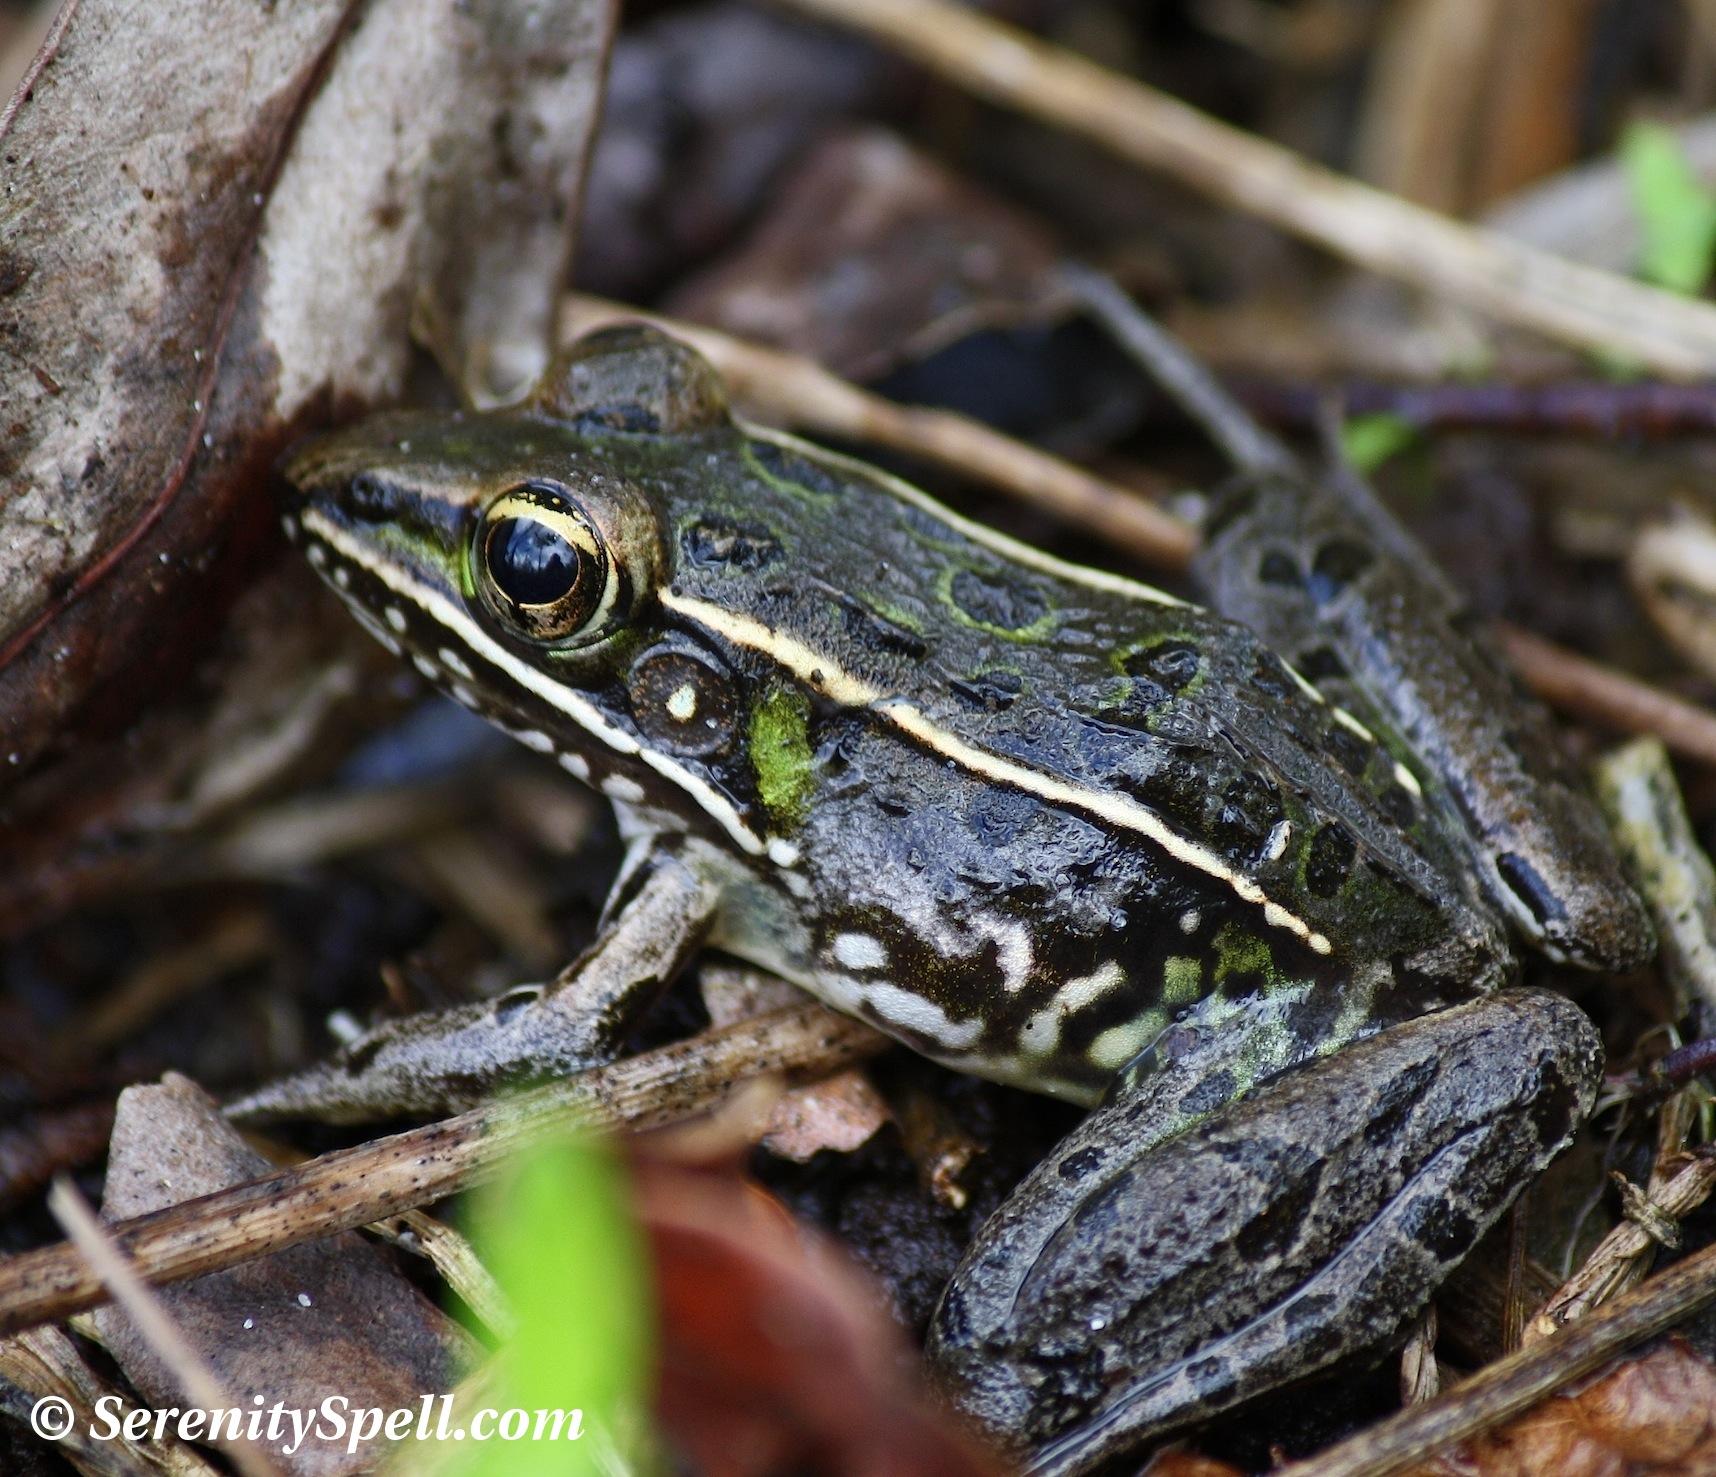 Wild Herps - Southern Leopard Frog (Lithobates sphenocephalus)